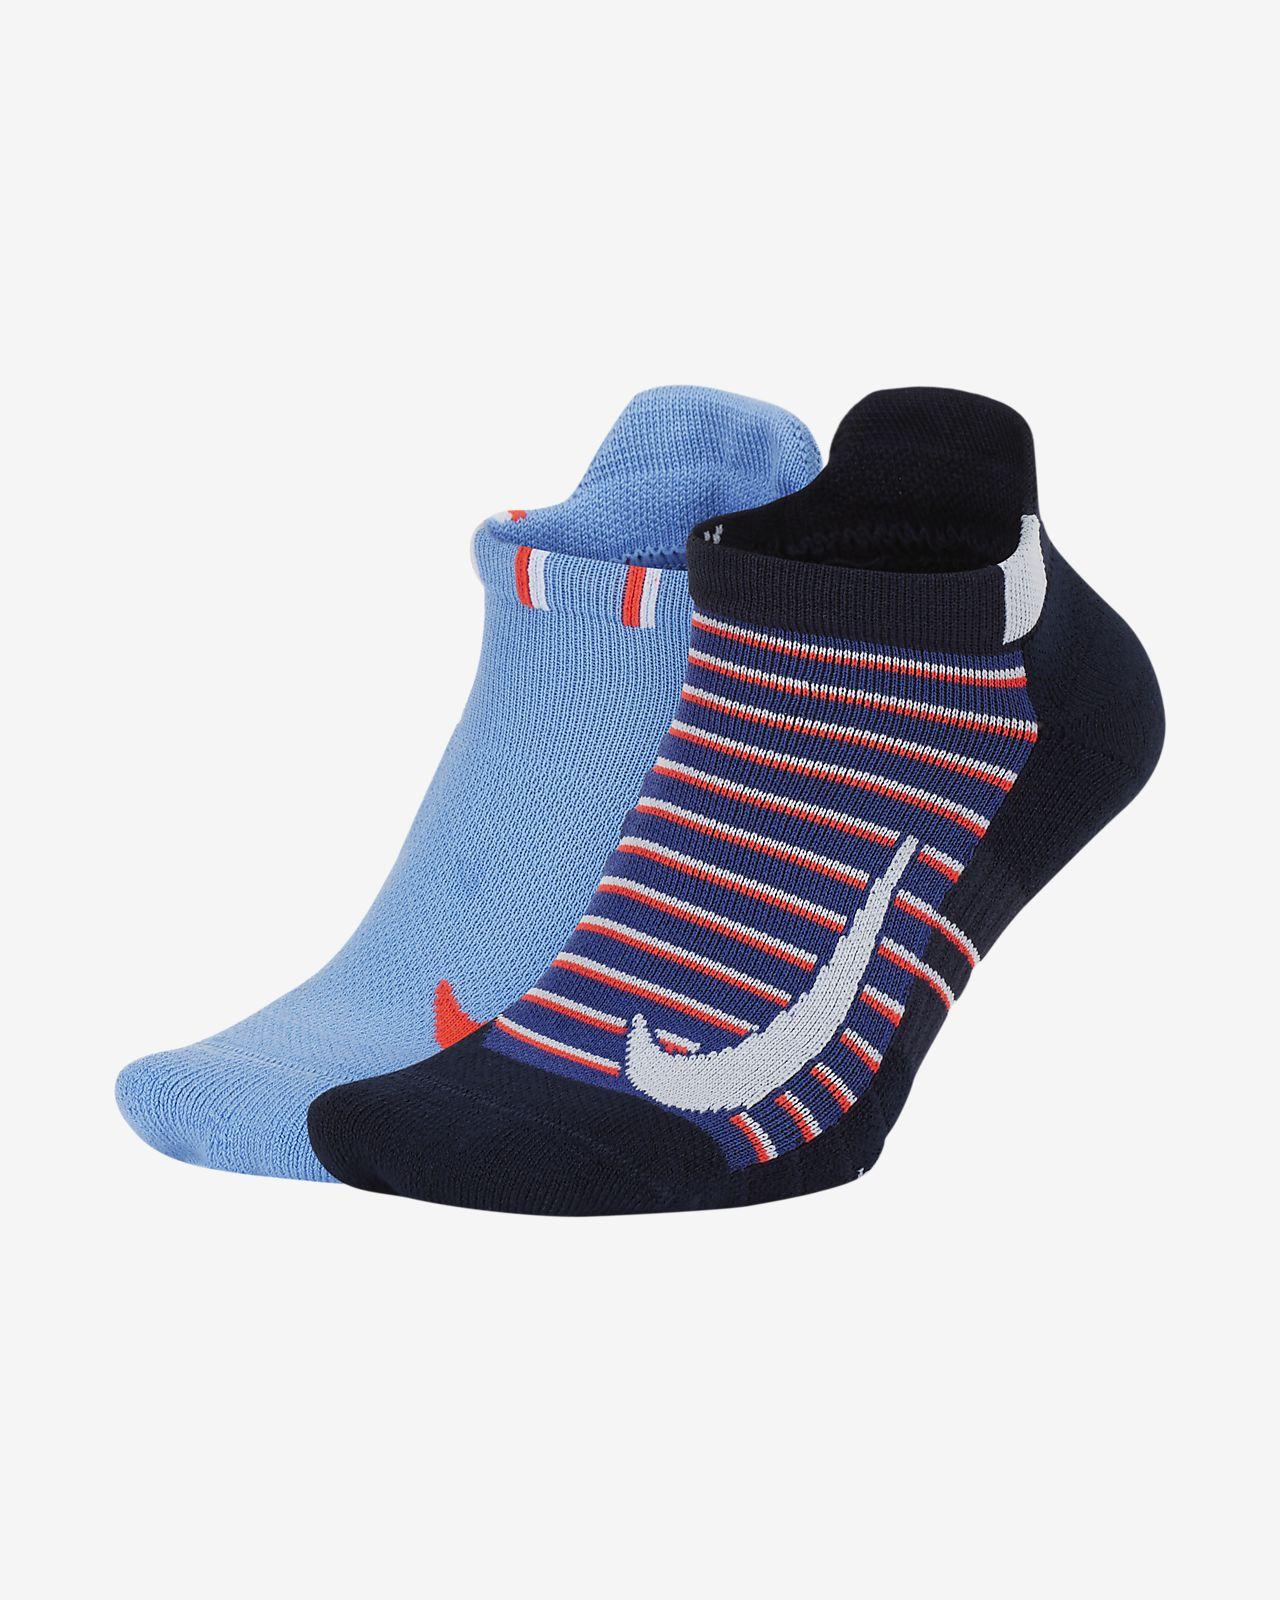 NikeCourt Multiplier Max Tennis No-Show Socks (2 Pairs)